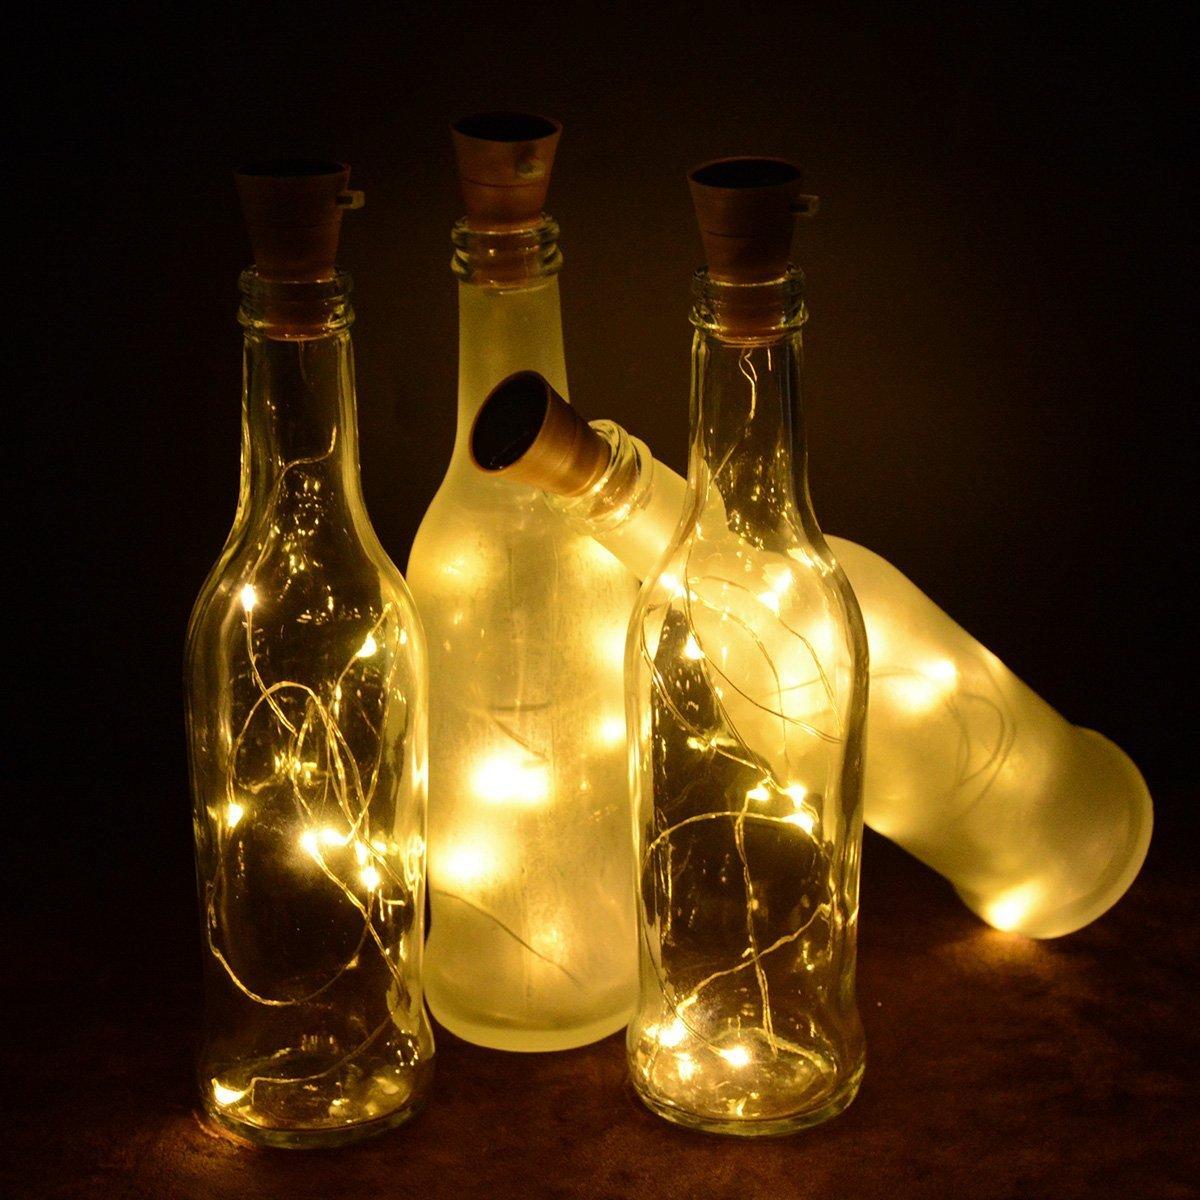 Okapia 6 Sets Cork Light for Wine Bottle Solar Fairy Lights for Wedding Home Bedroom Party Jar Decoration Warm White